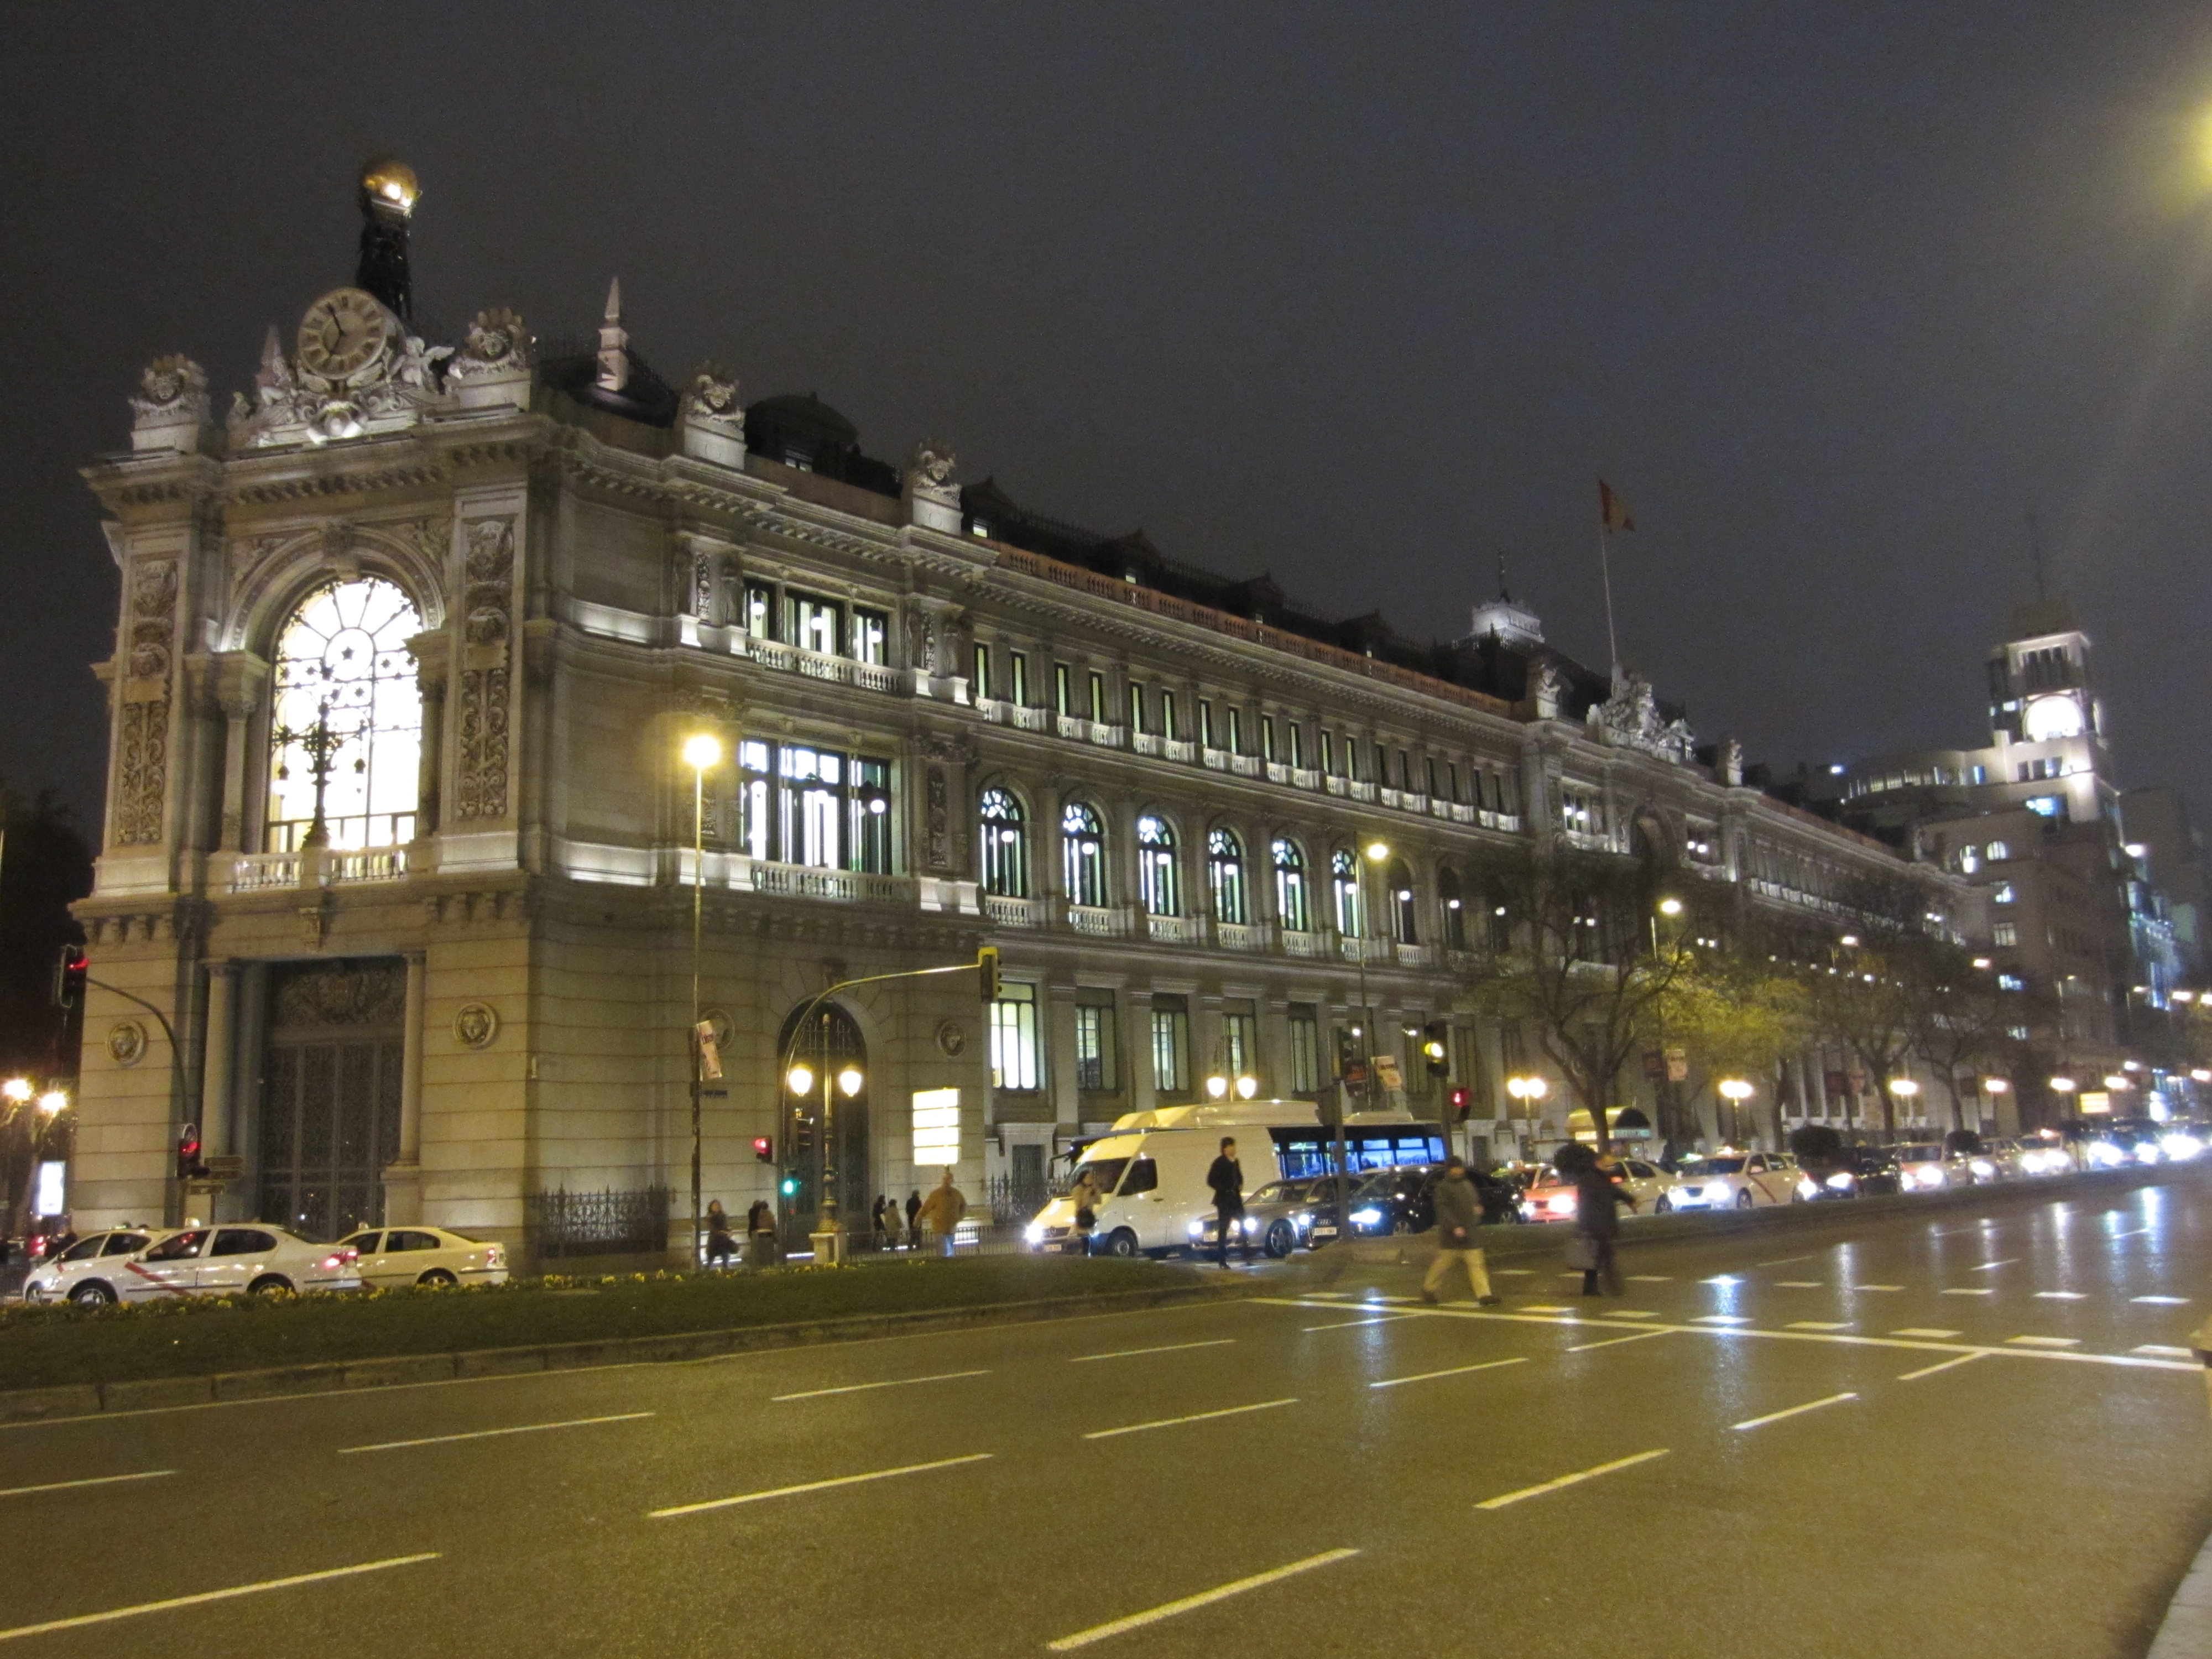 Banco de espa a un plan de acero aliapiedi por for Sucursales banco espana